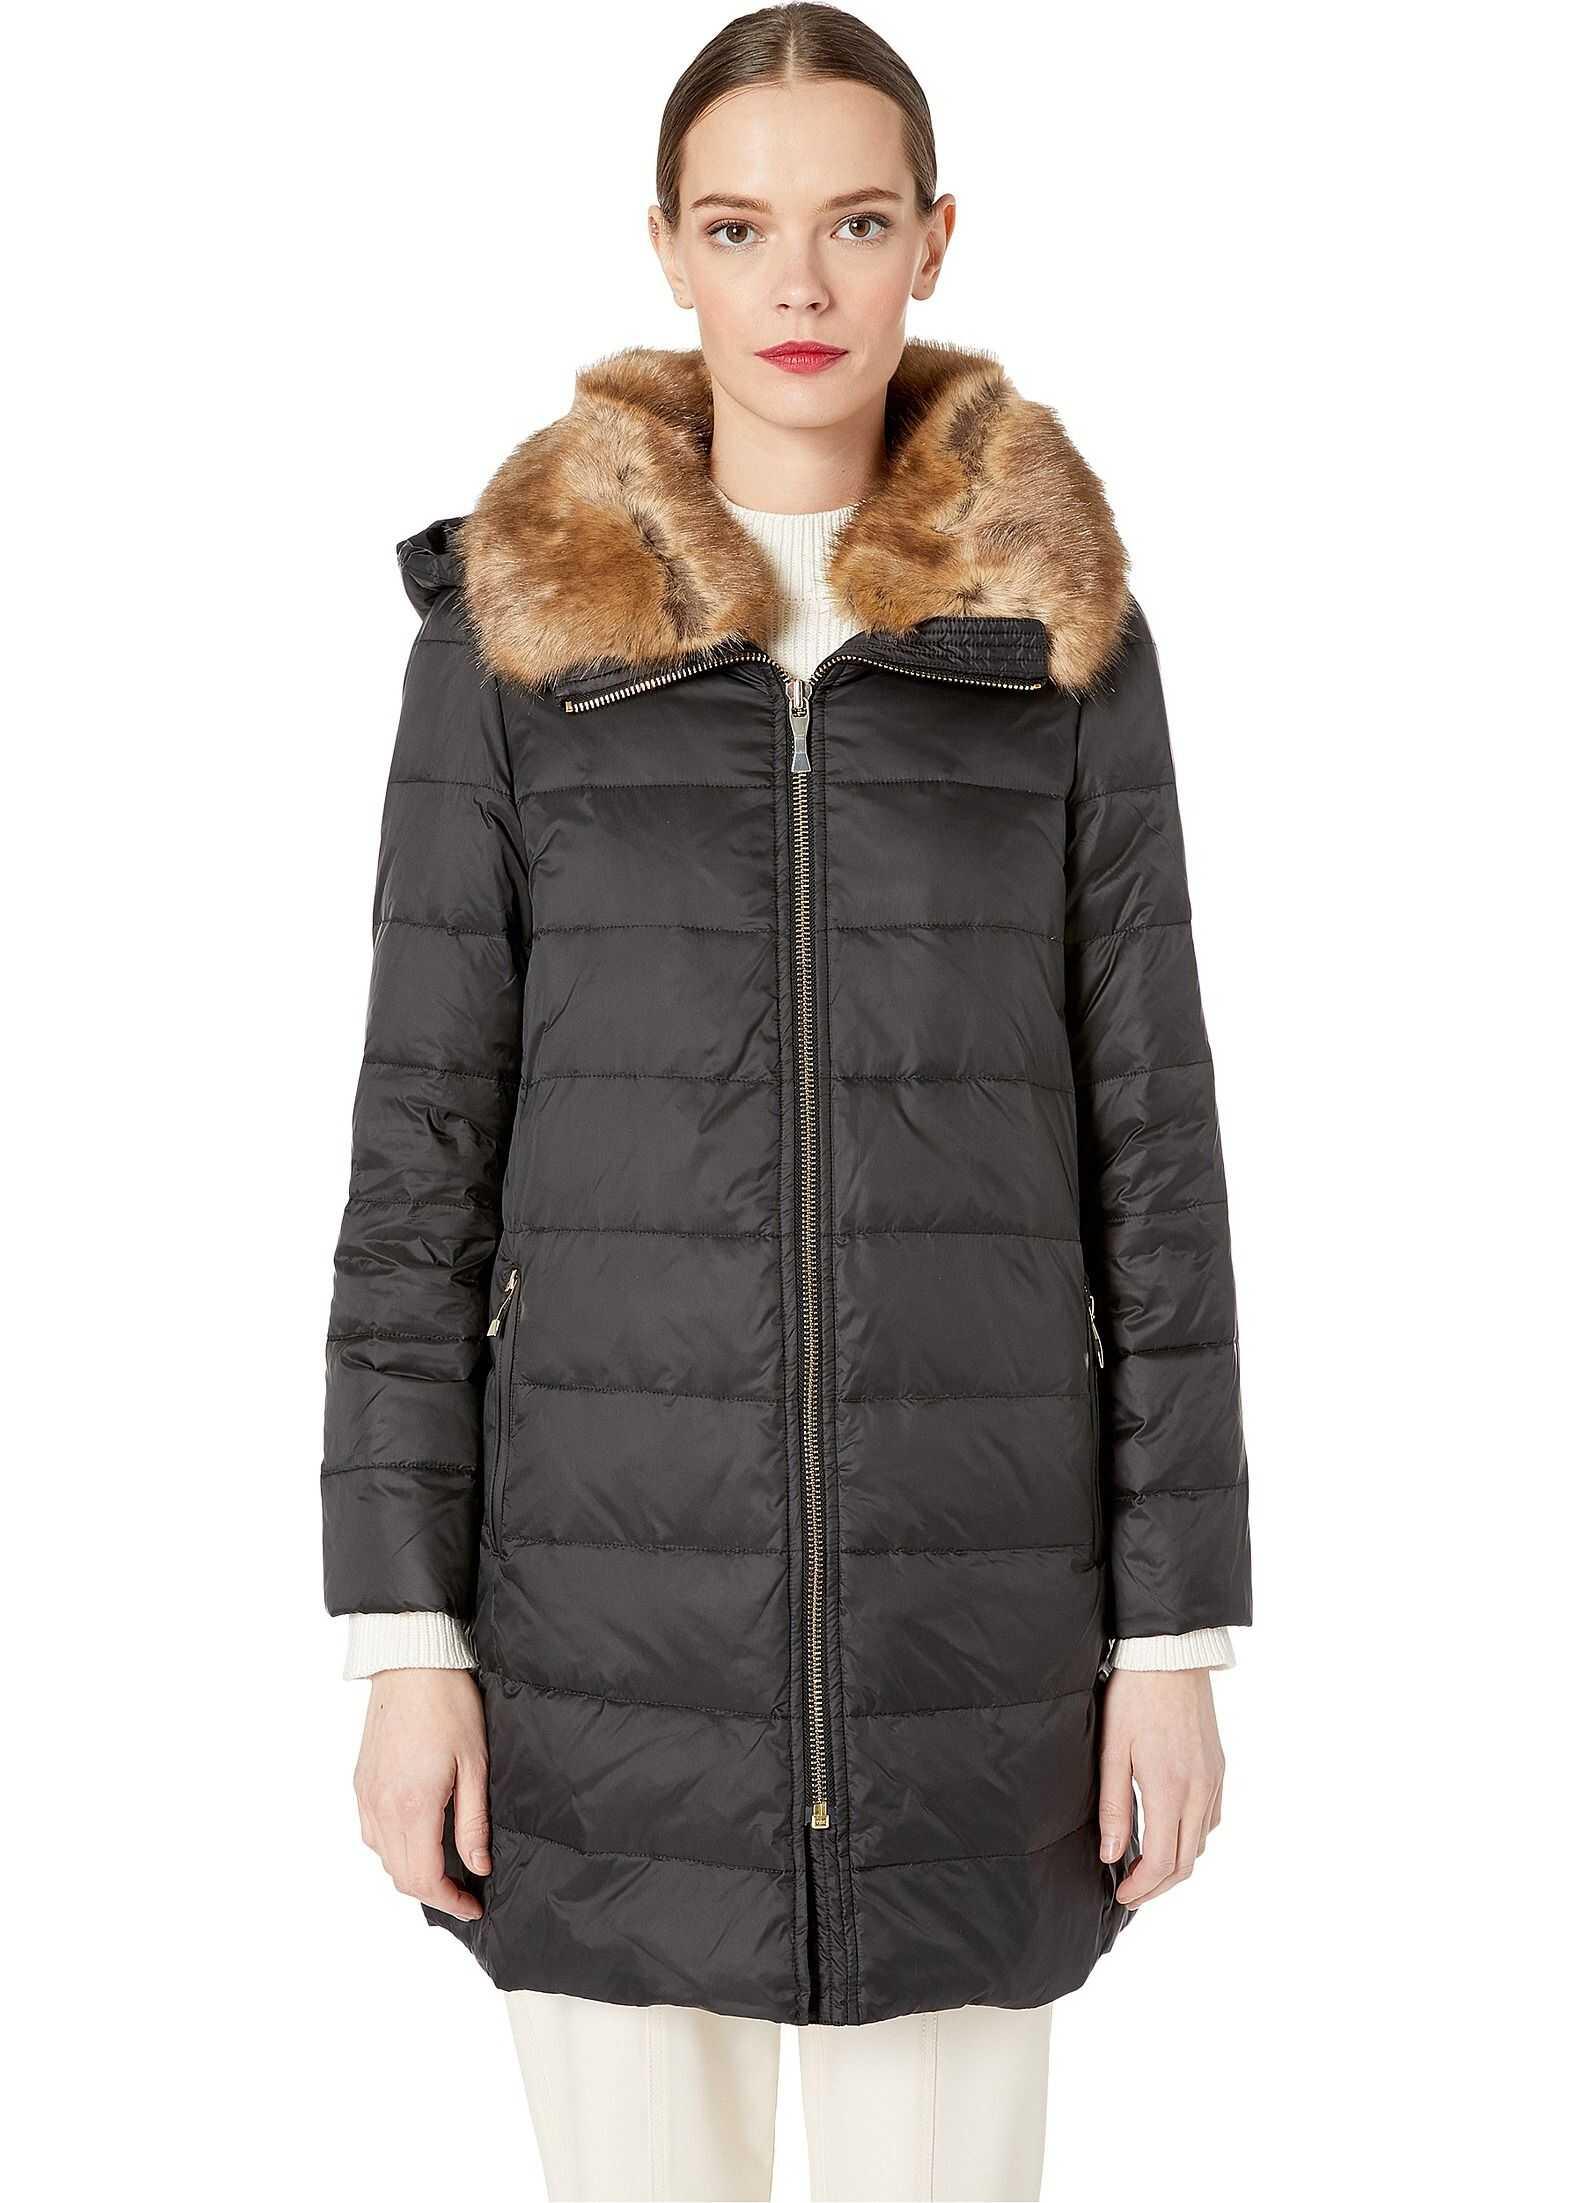 Kate Spade New York Faux Fur Puffer Jacket Black